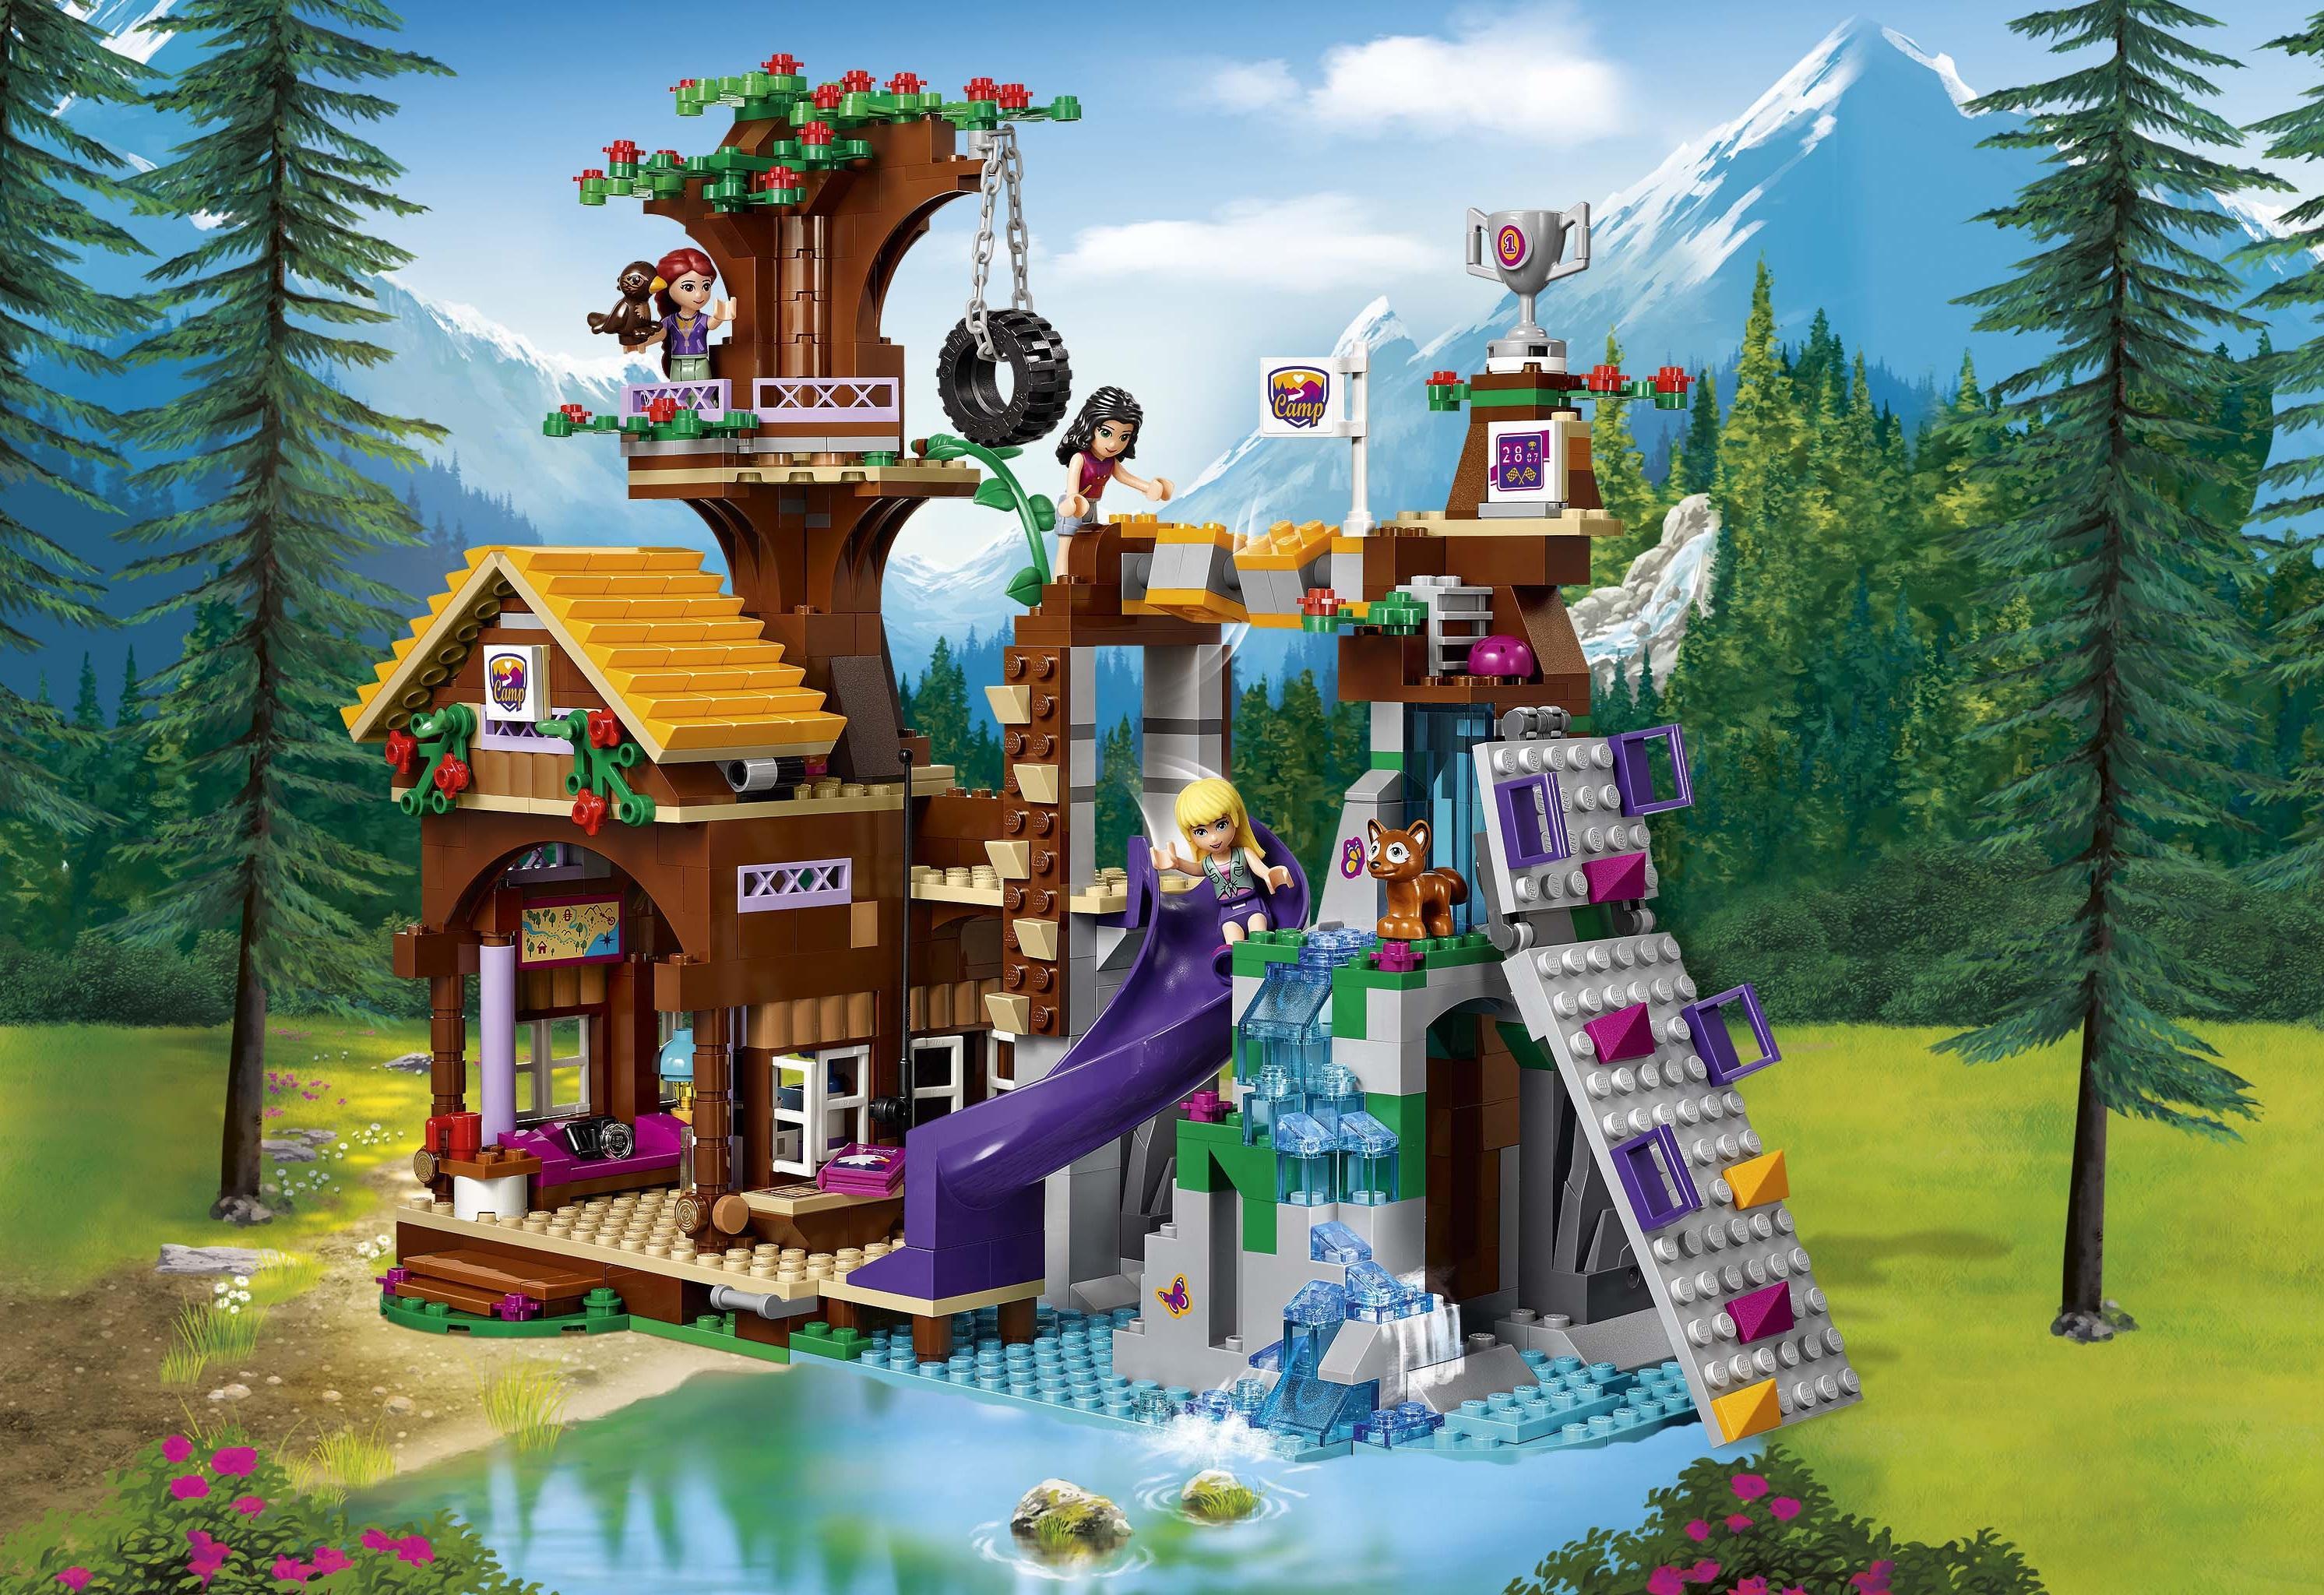 Lego friends 41122 abenteuercamp baumhaus for Amazon casa